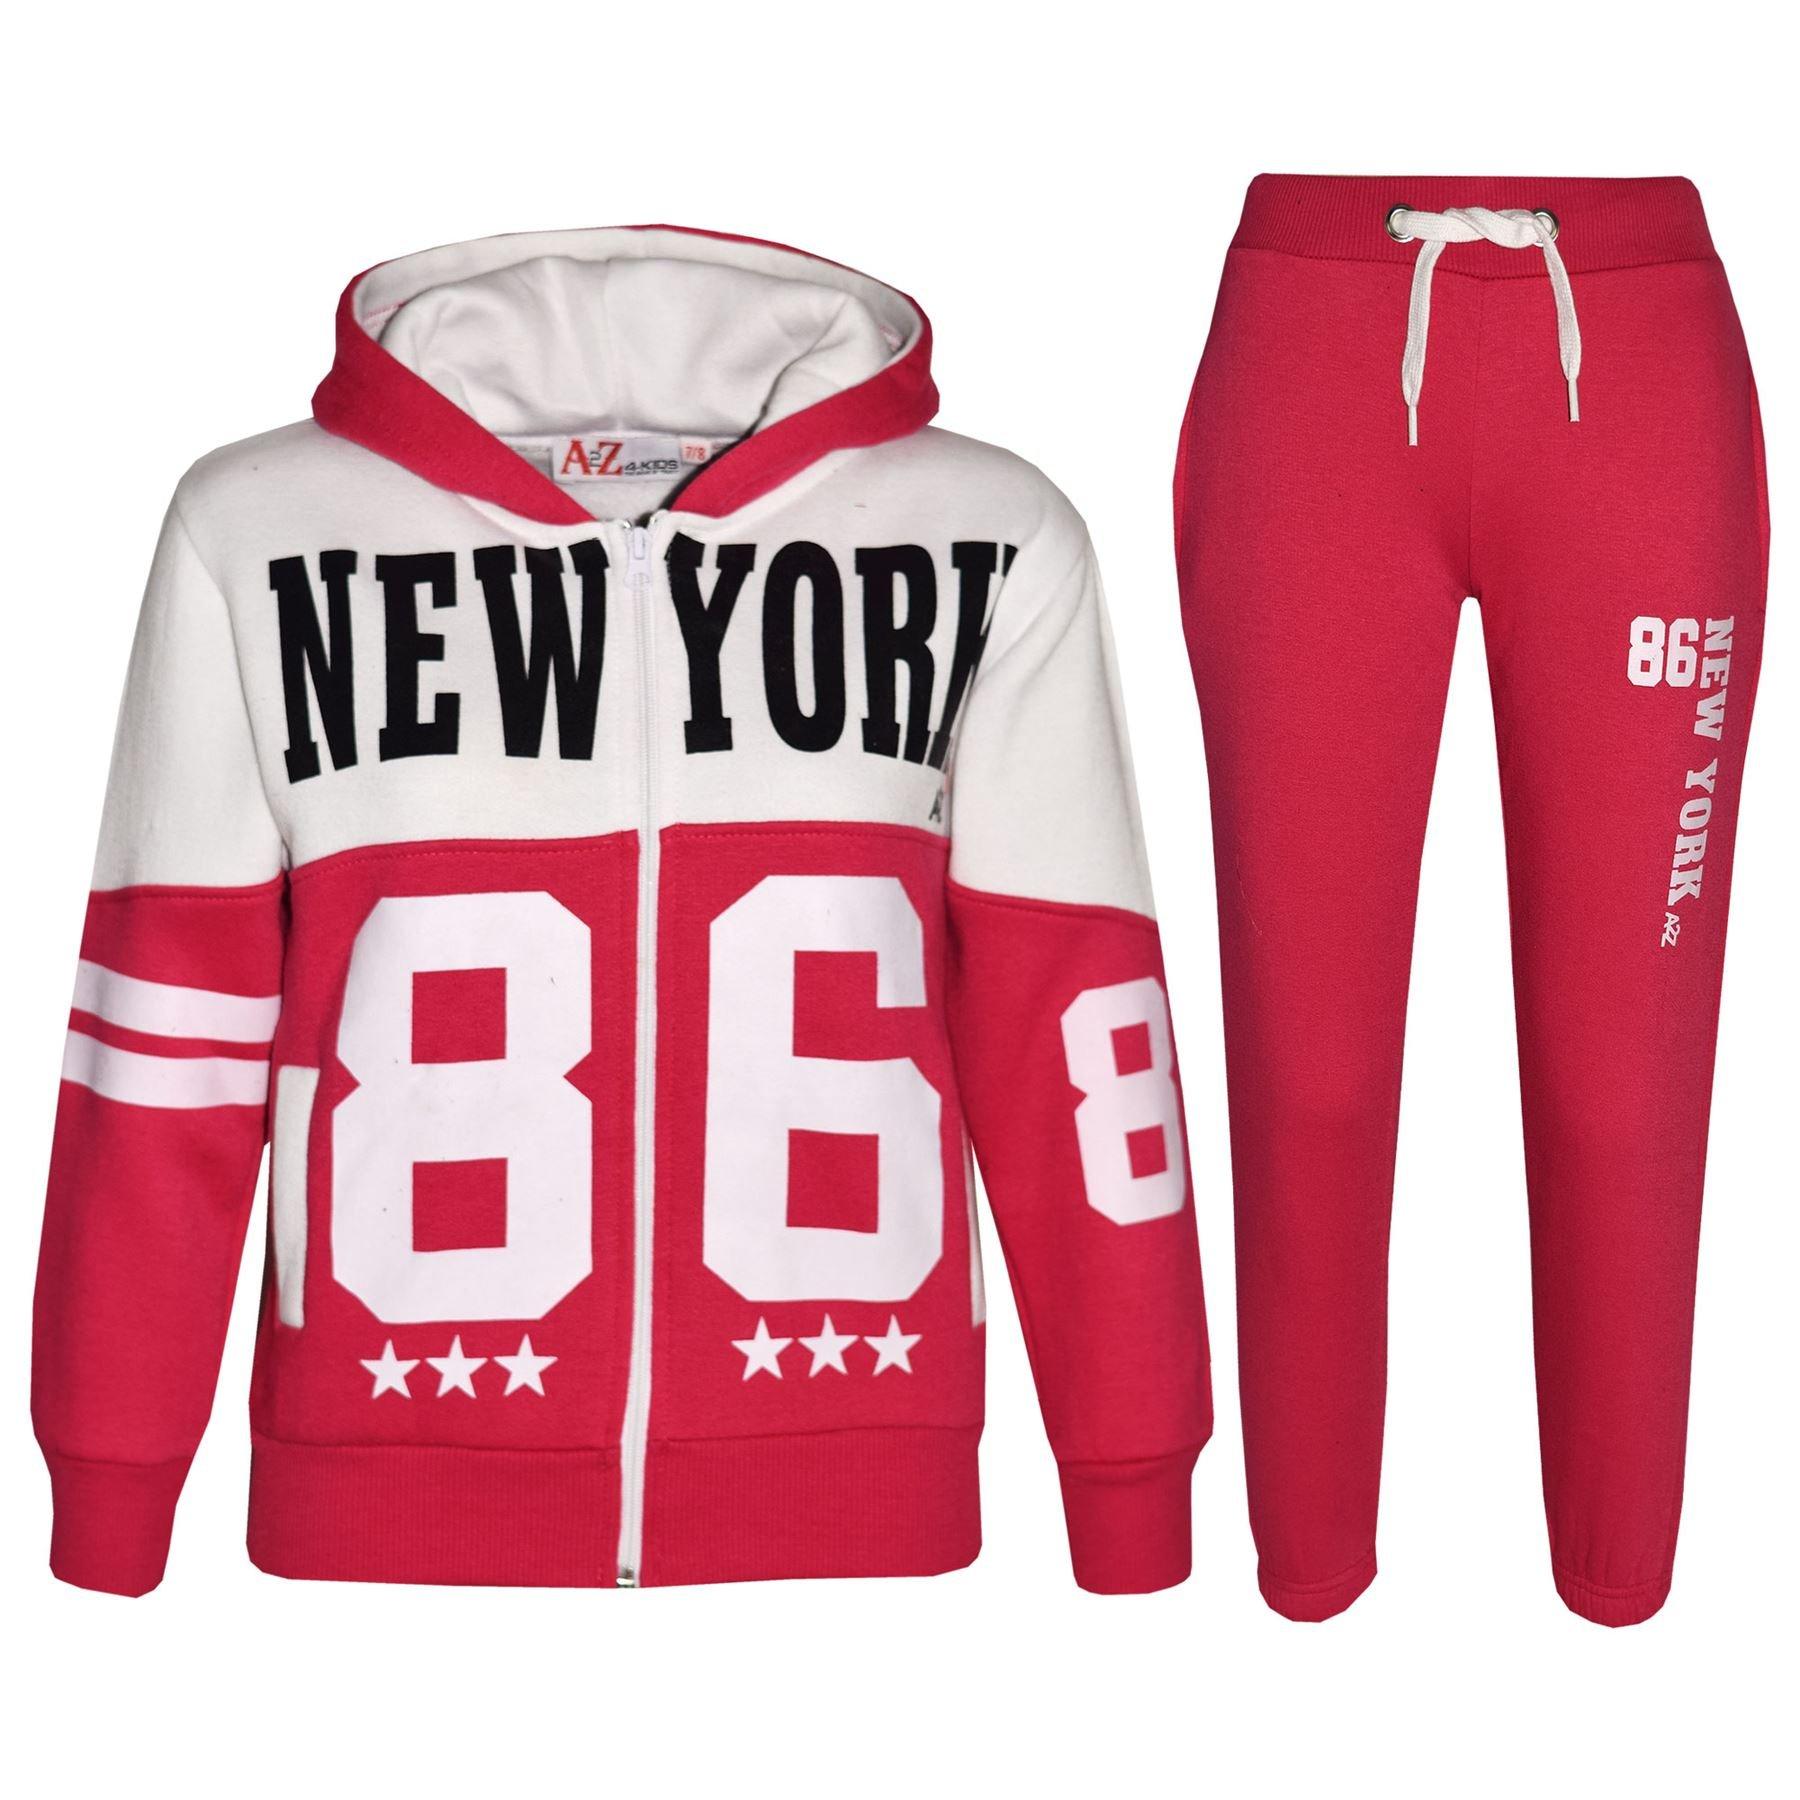 GIRLS BOYS NEW YORK DESIGNER TRACKSUIT HOODED TOP JOGGING BOTTOMS KIDS 2PCS SET